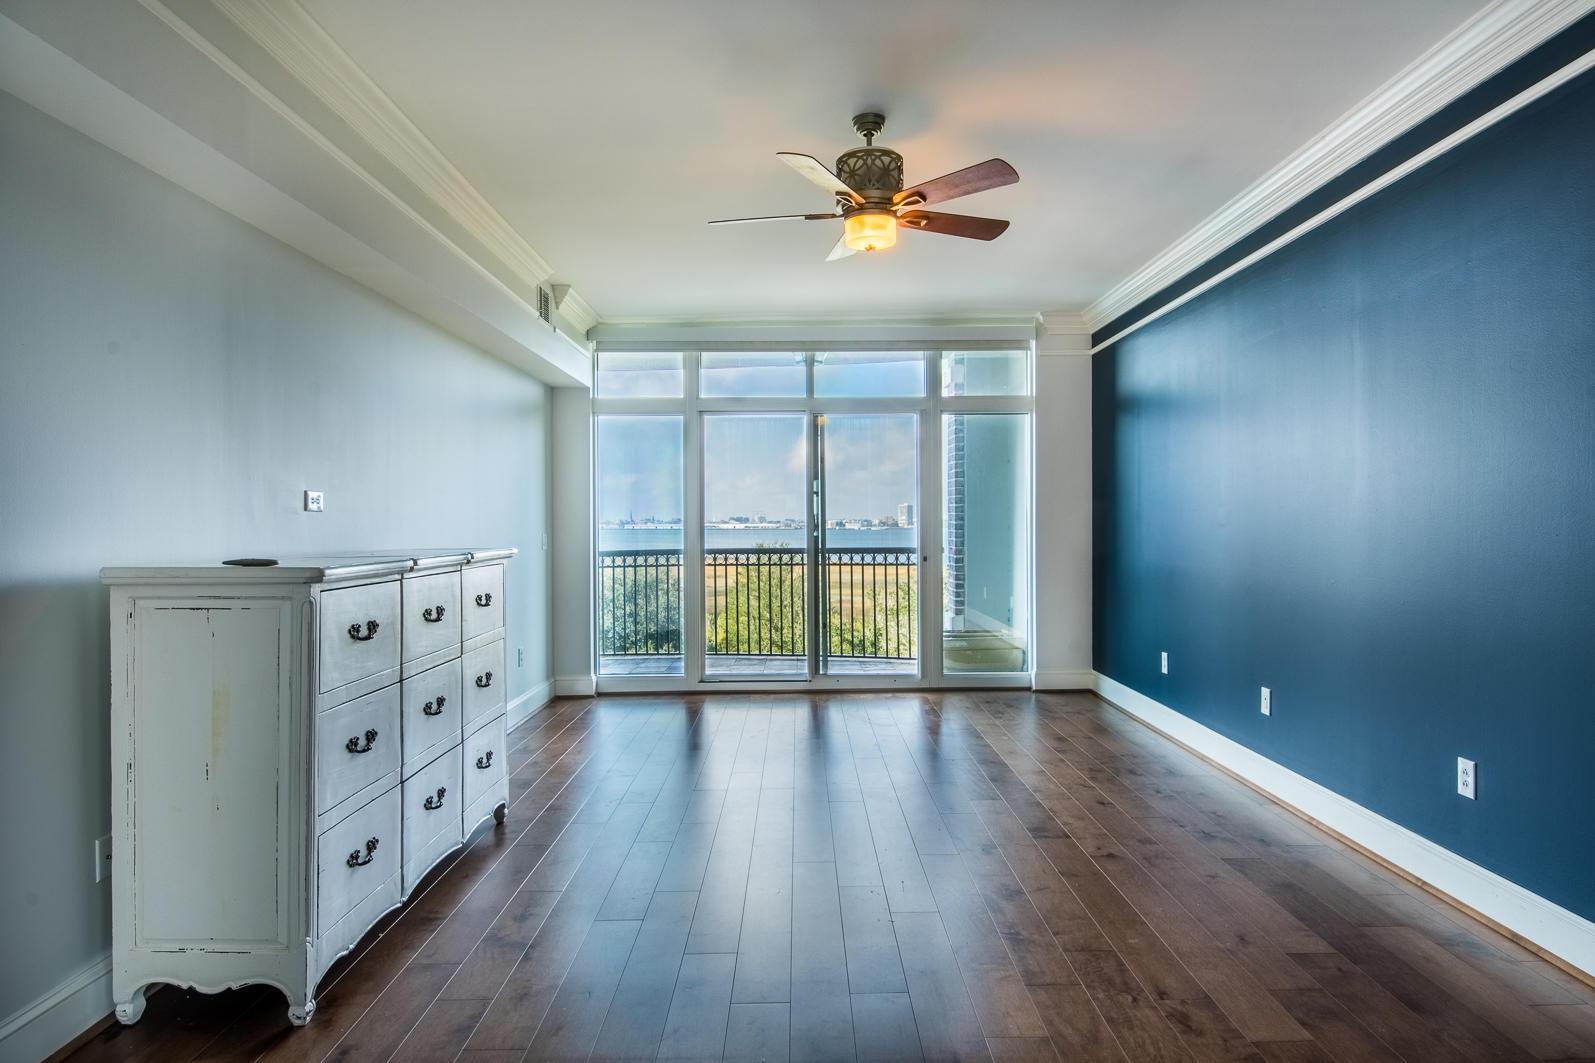 Renaissance On Chas Harbor Homes For Sale - 144 Plaza, Mount Pleasant, SC - 1